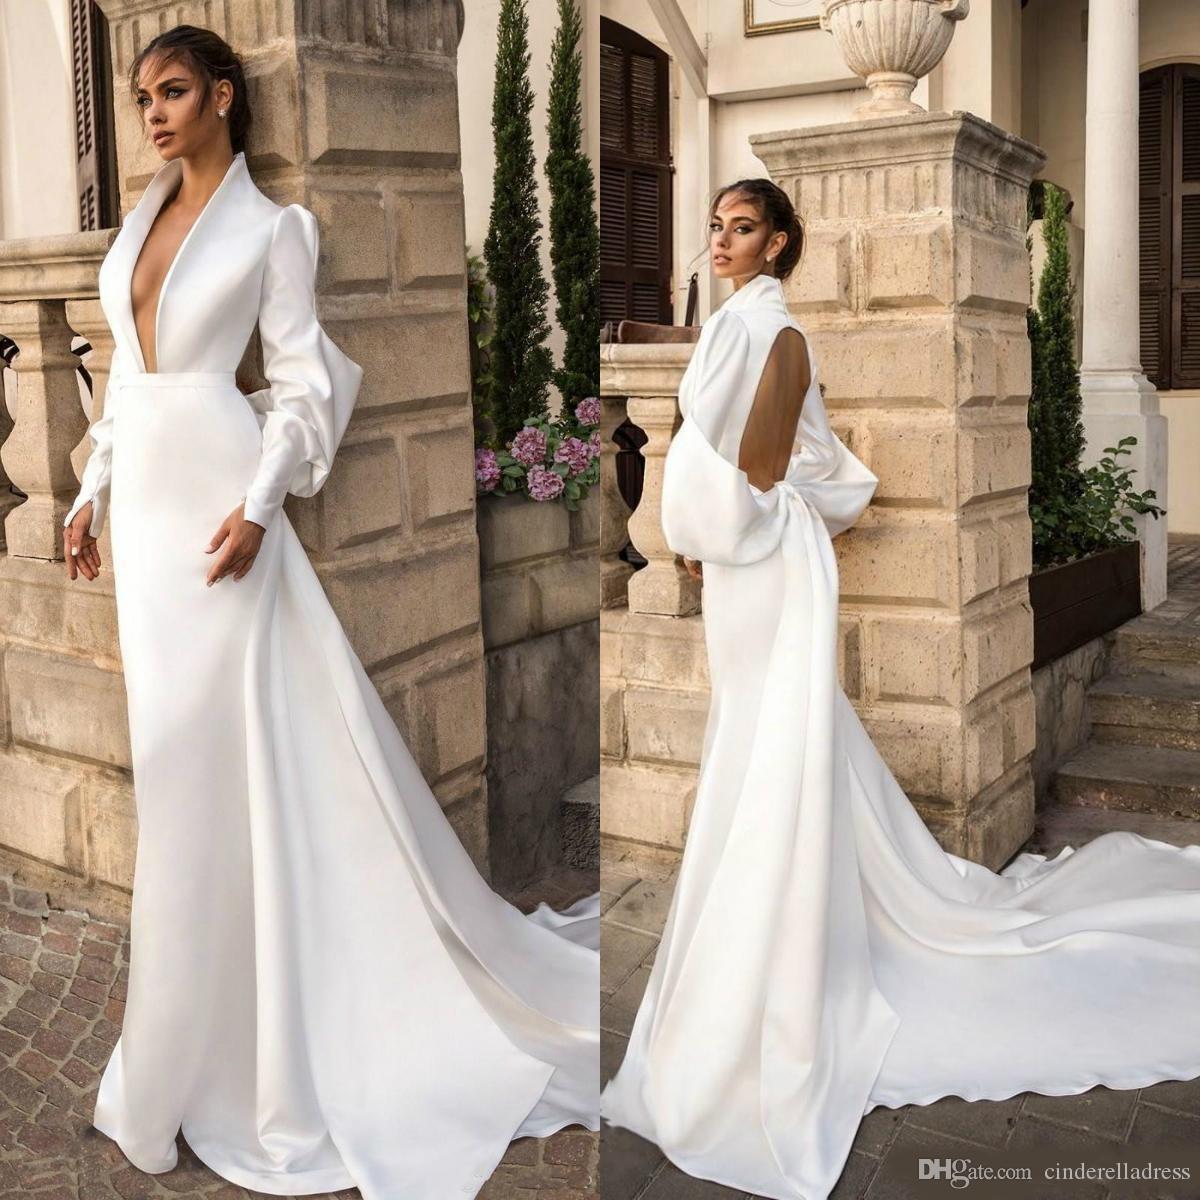 2020 White Satin Mermaid Wedding Dresses Deep V Neck Long Sleeve Garden Sweep Train Plus Size Backless Wedding Dress Bridal Gown